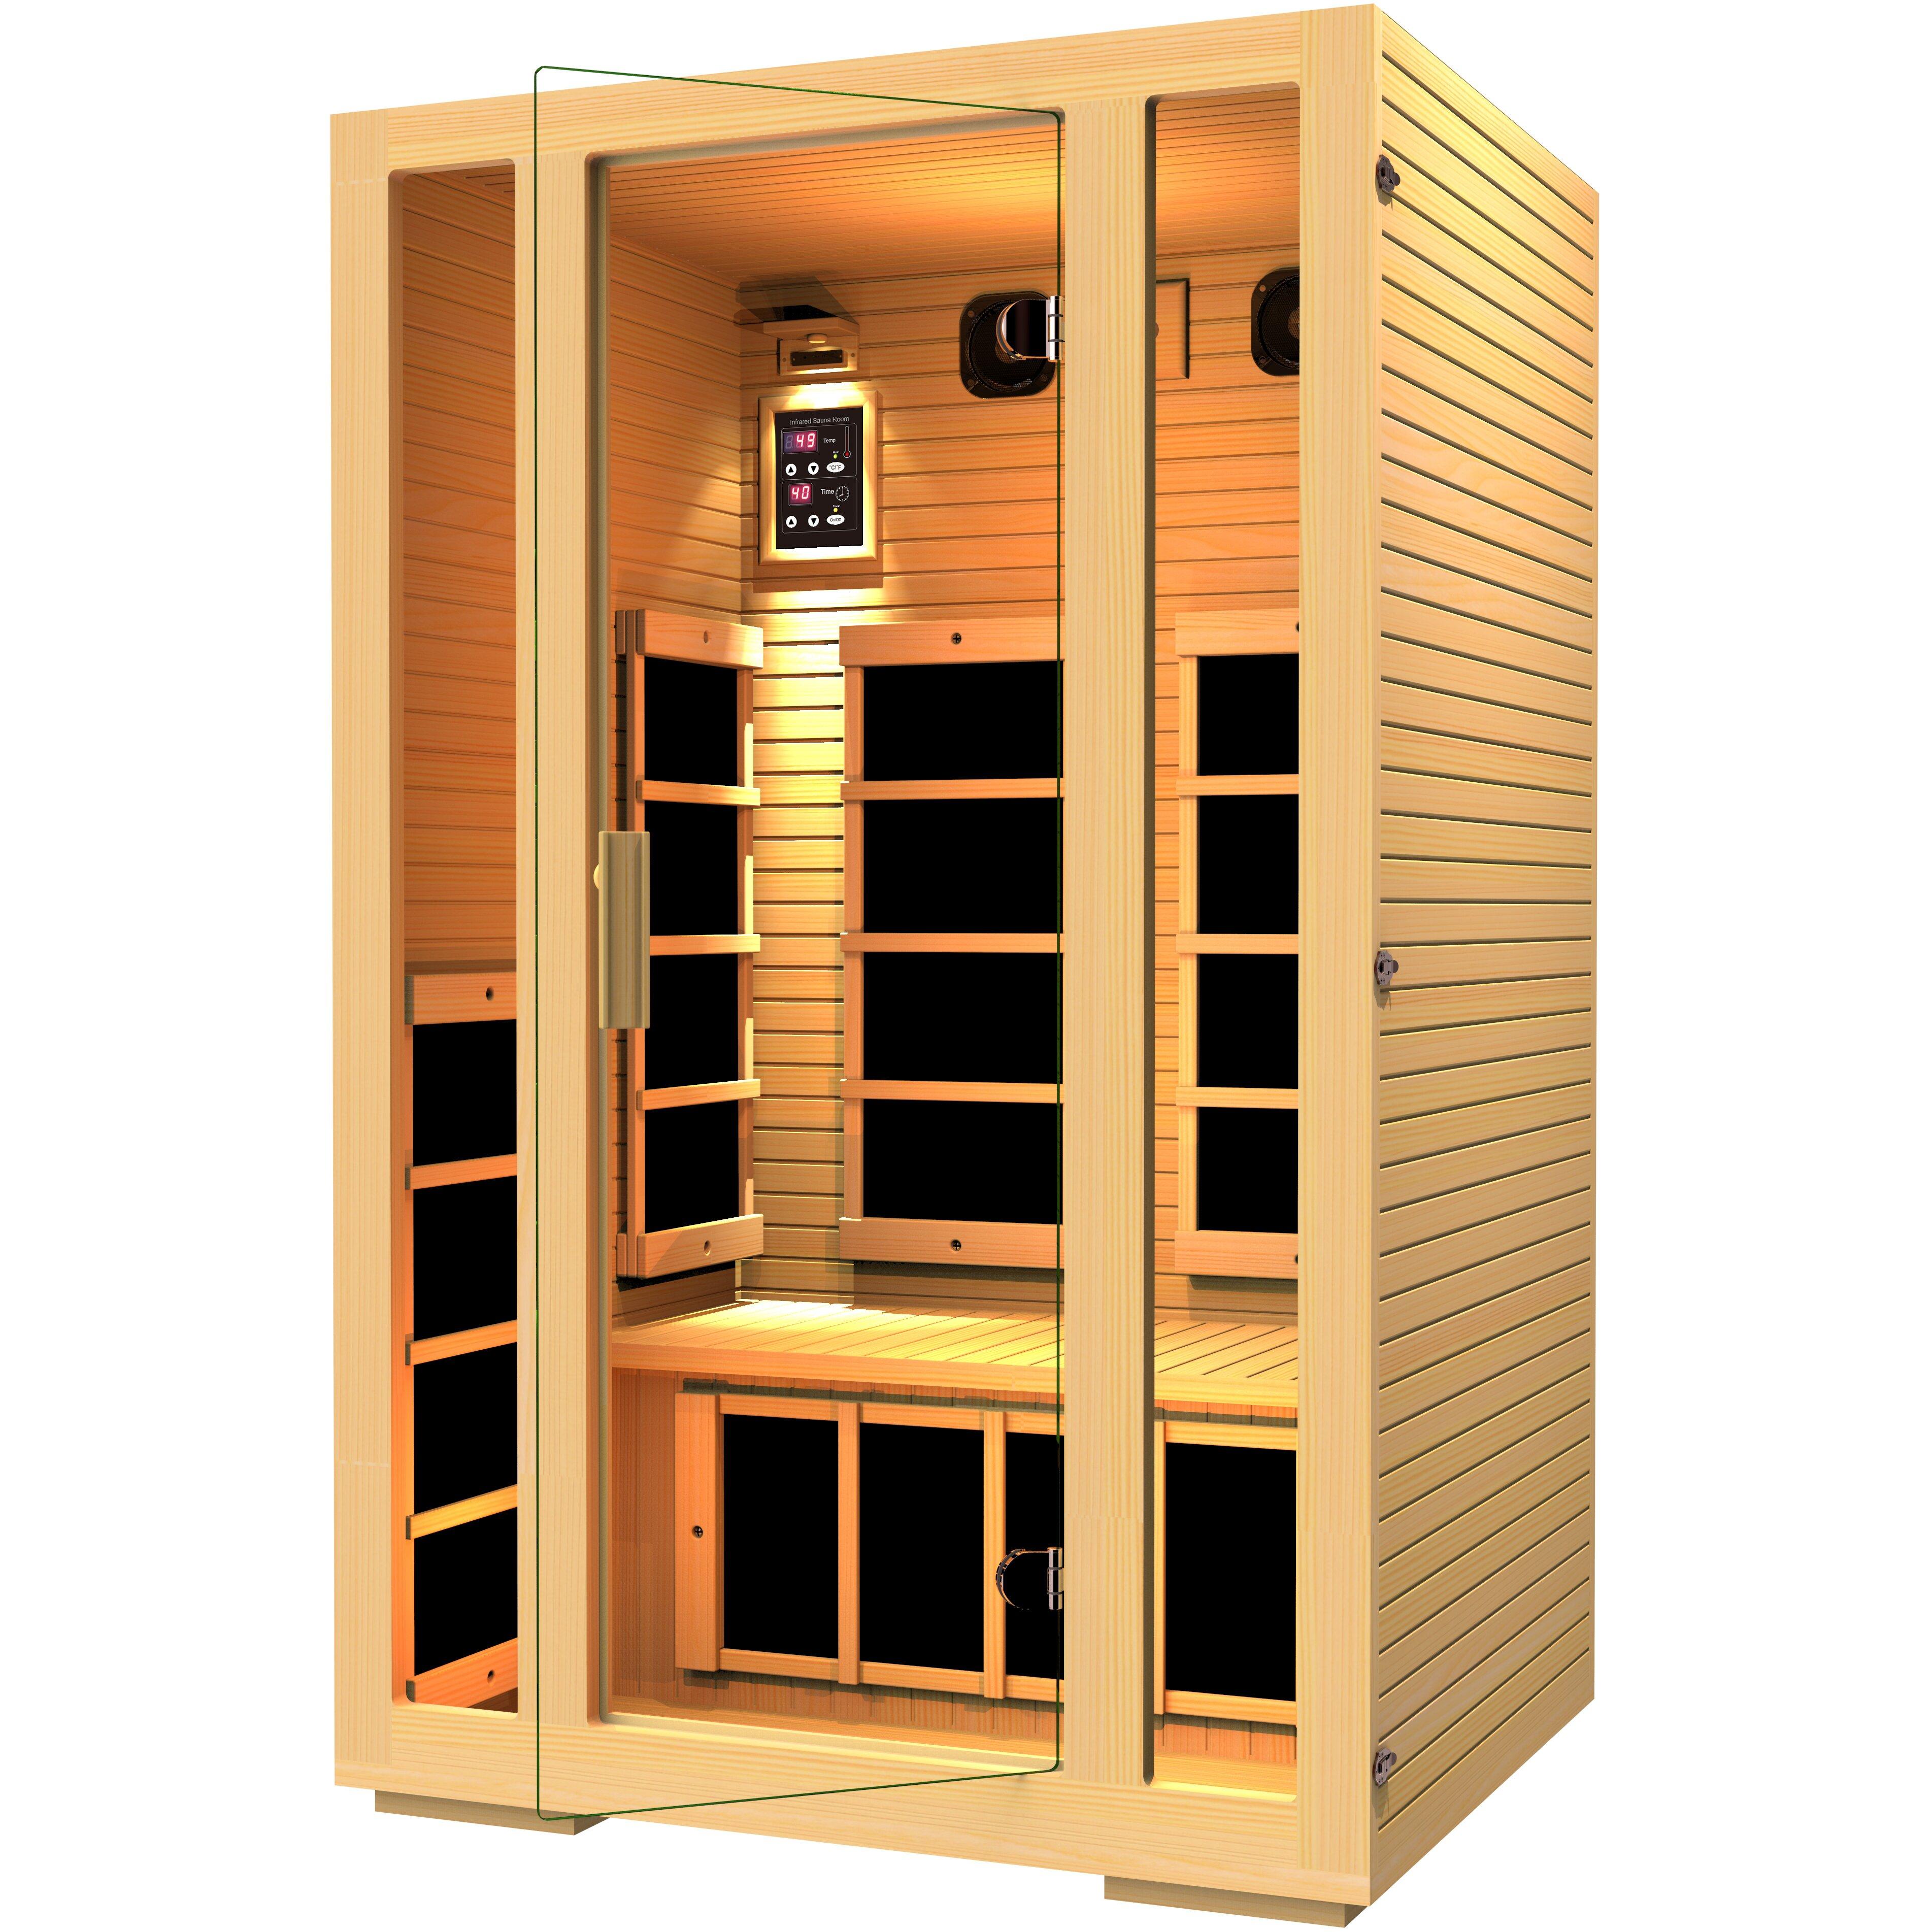 Jnh Lifestyles Joyous 2 Person Carbon Far Infrared Sauna